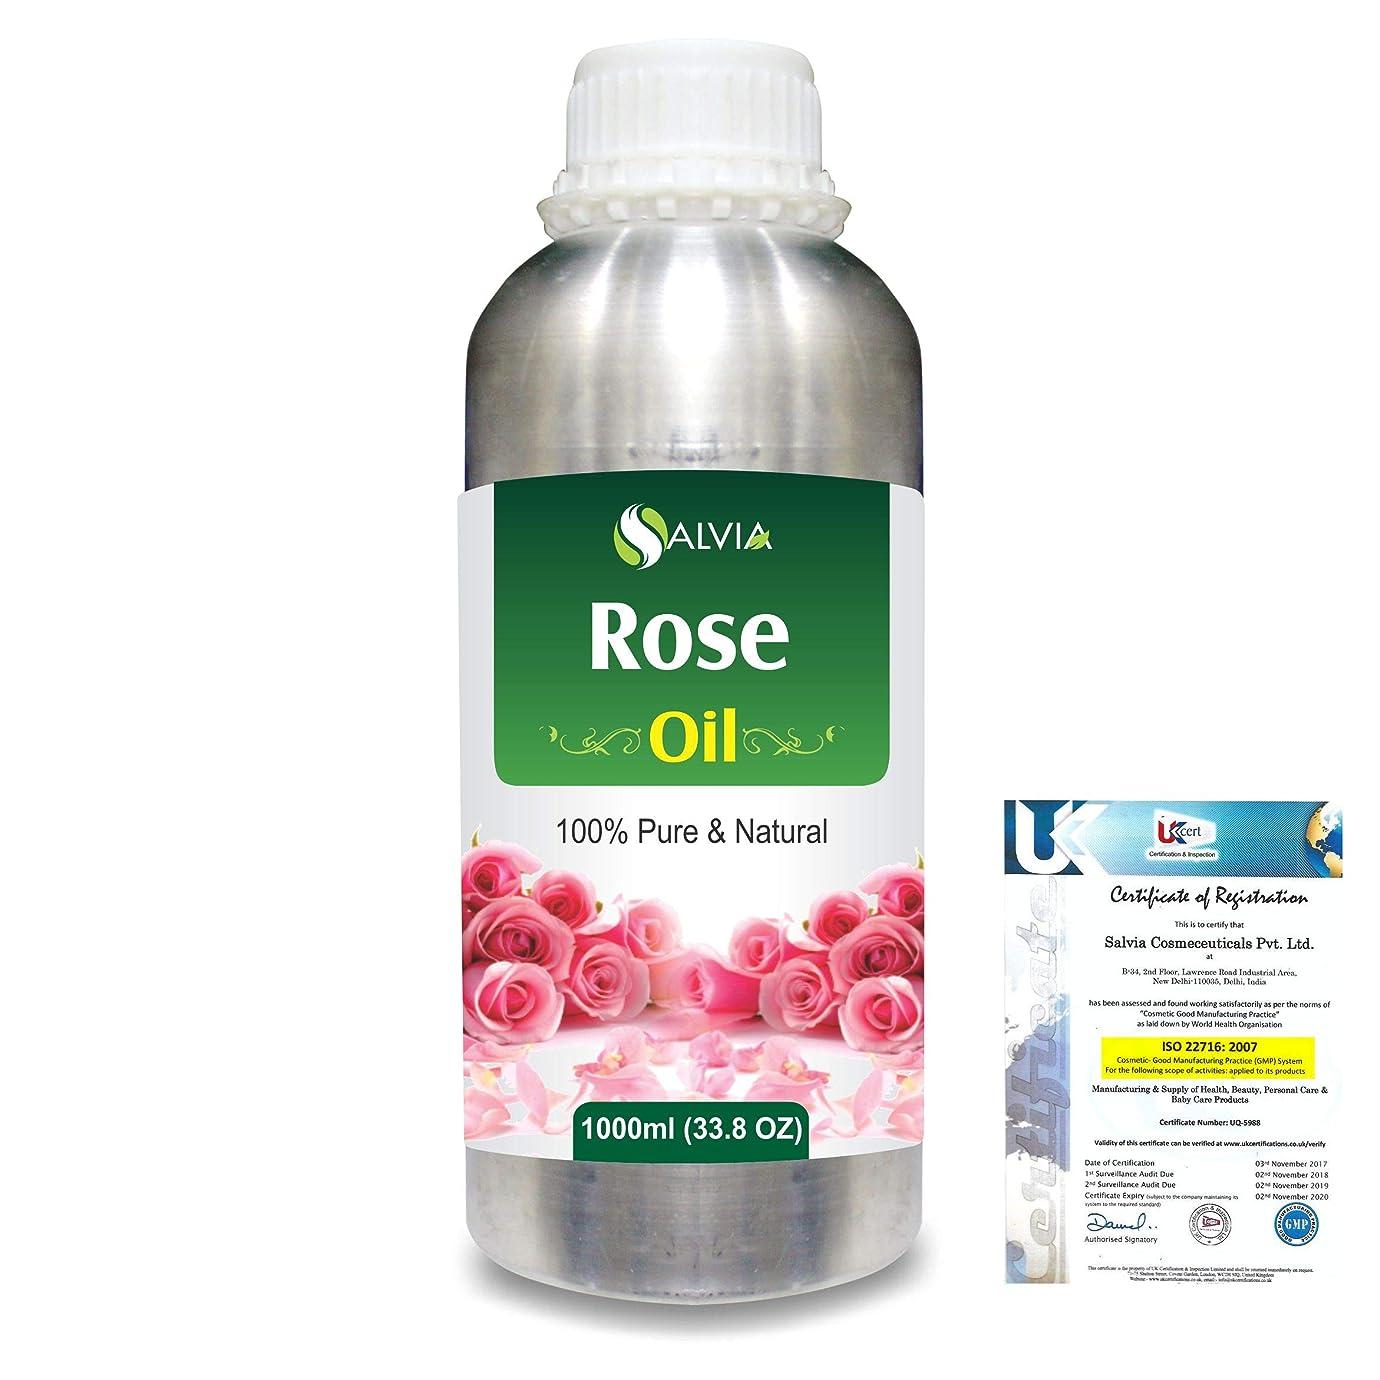 口径習慣温帯Rose (Rosa Damacenia) 100% Natural Pure Essential Oil 1000ml/33.8fl.oz.